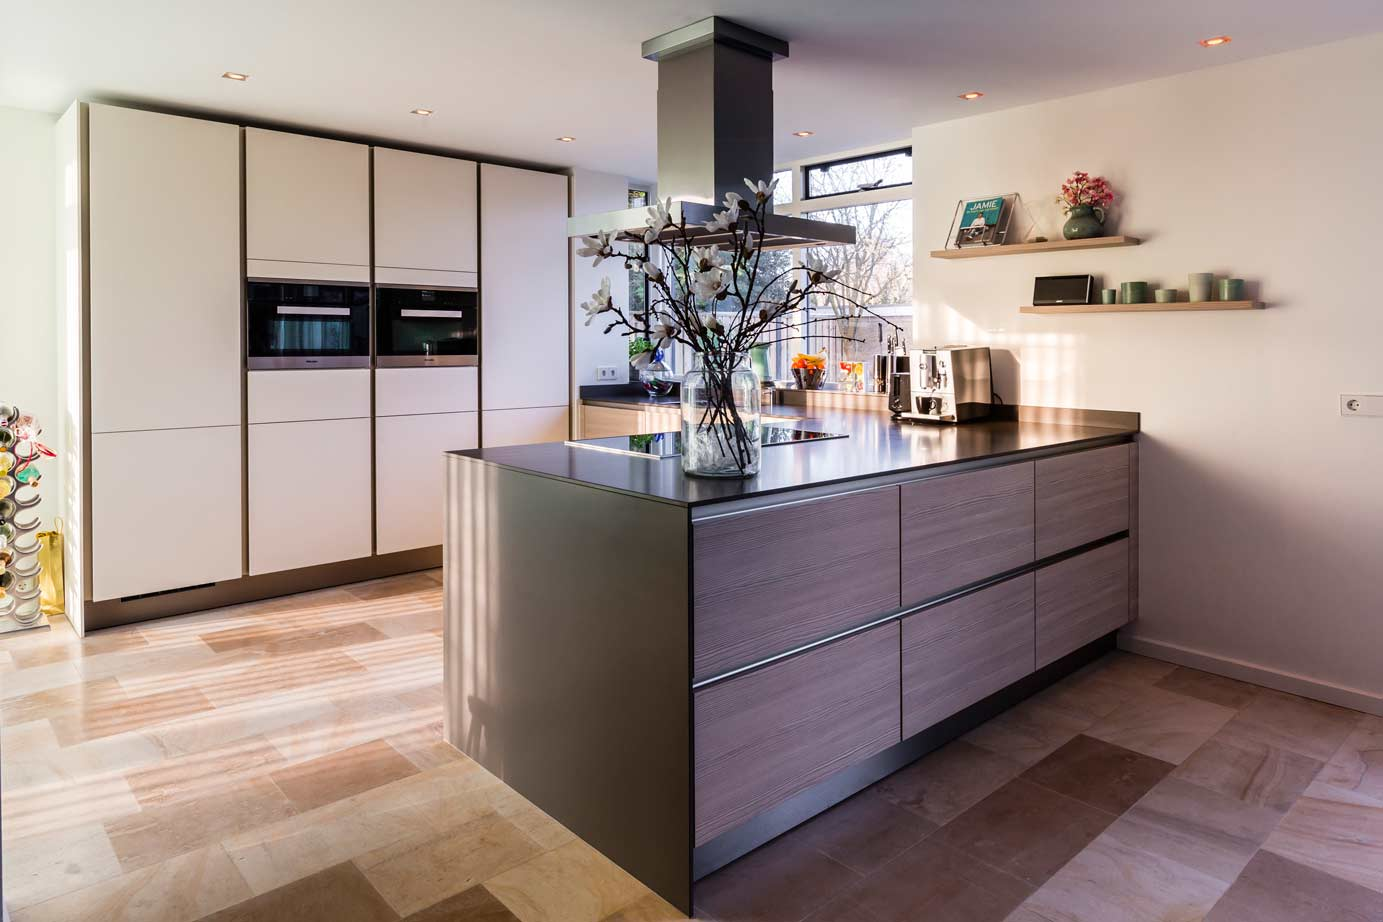 Standaard Keuken Maten : Luxe keukens standaard of maatwerk hoge klanttevredenheid pelma